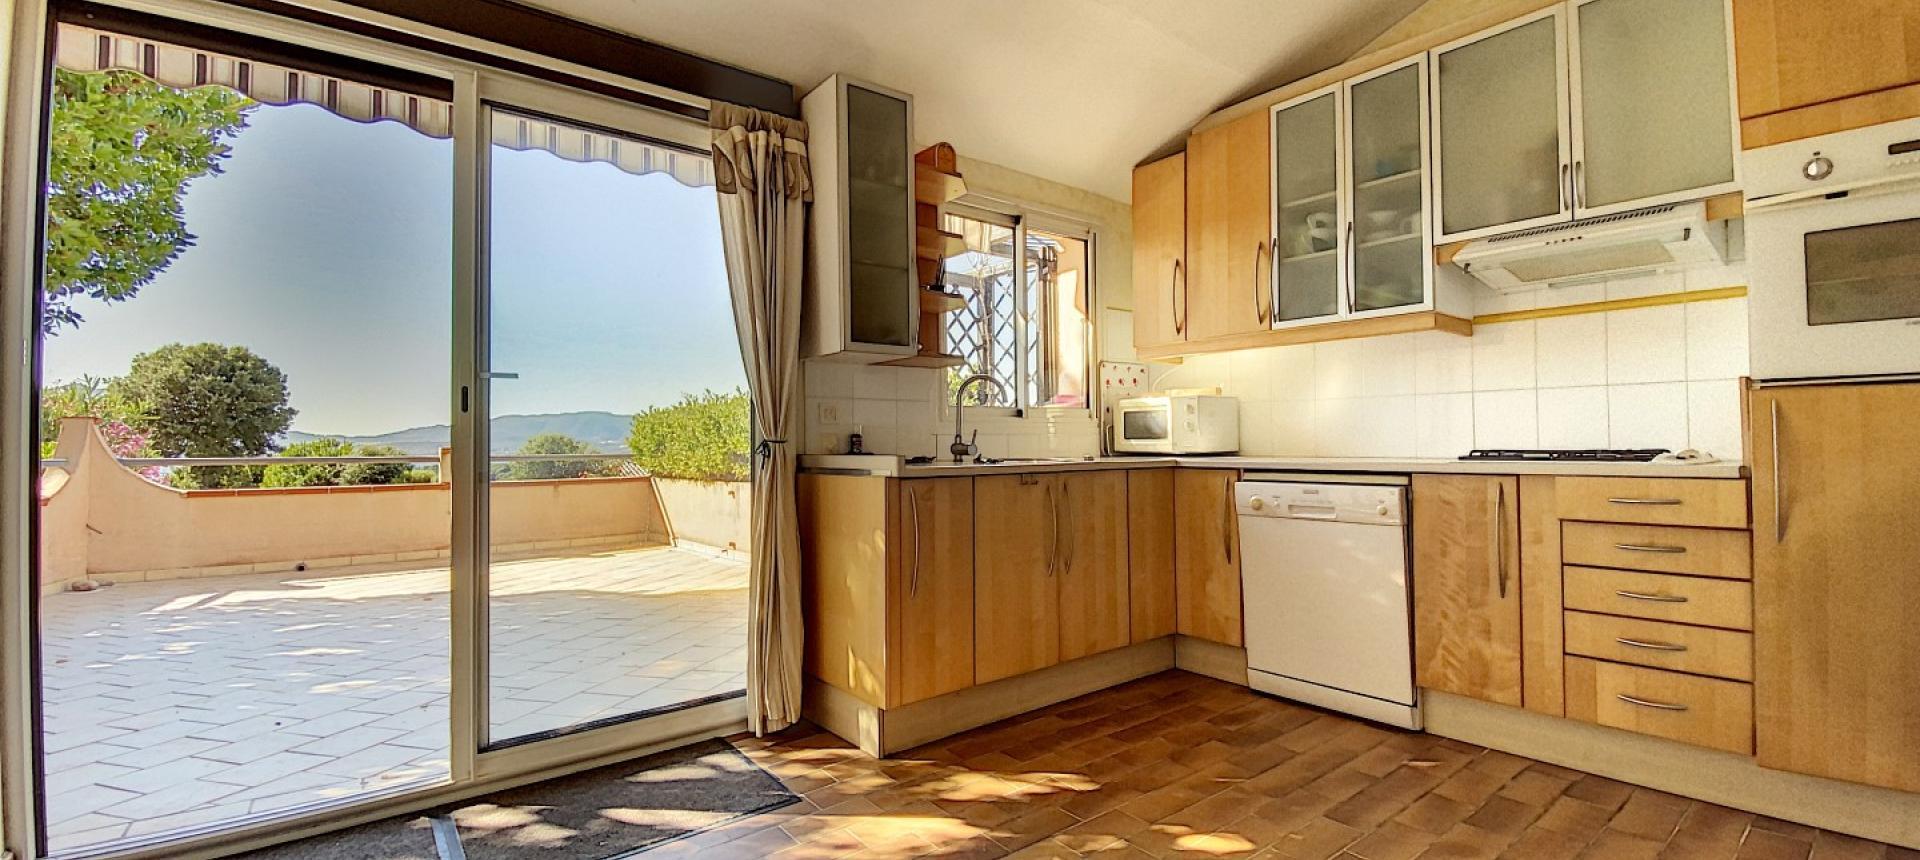 Maison à vendre à Porticcio - Rive sud Ajaccio- Cuisine